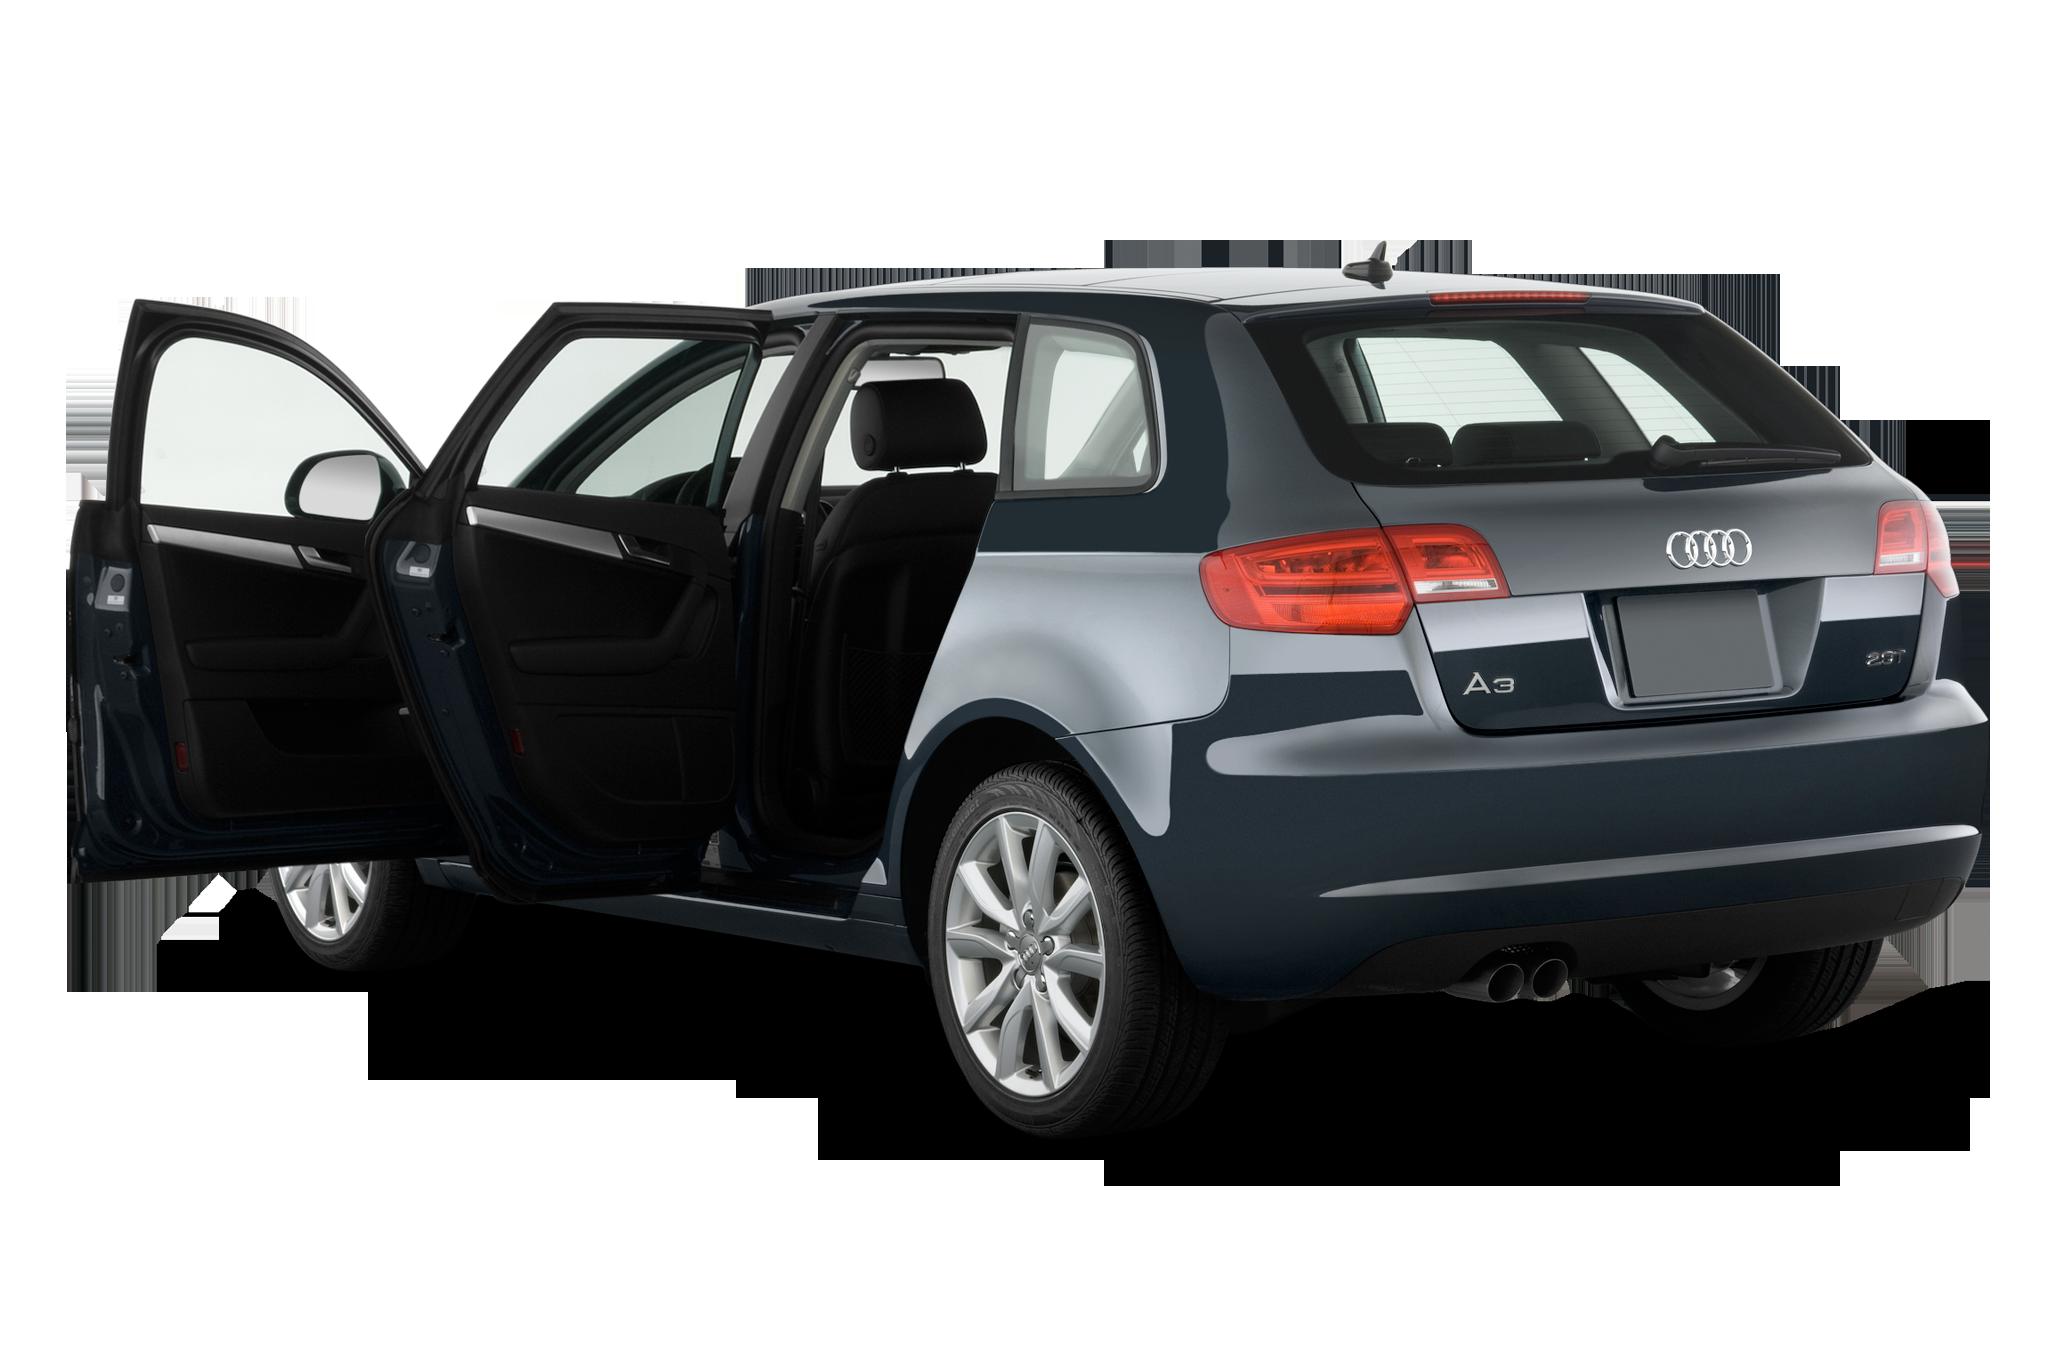 2010 Audi A3 Tdi Audi Diesel Luxury Wagon Review Automobile Magazine